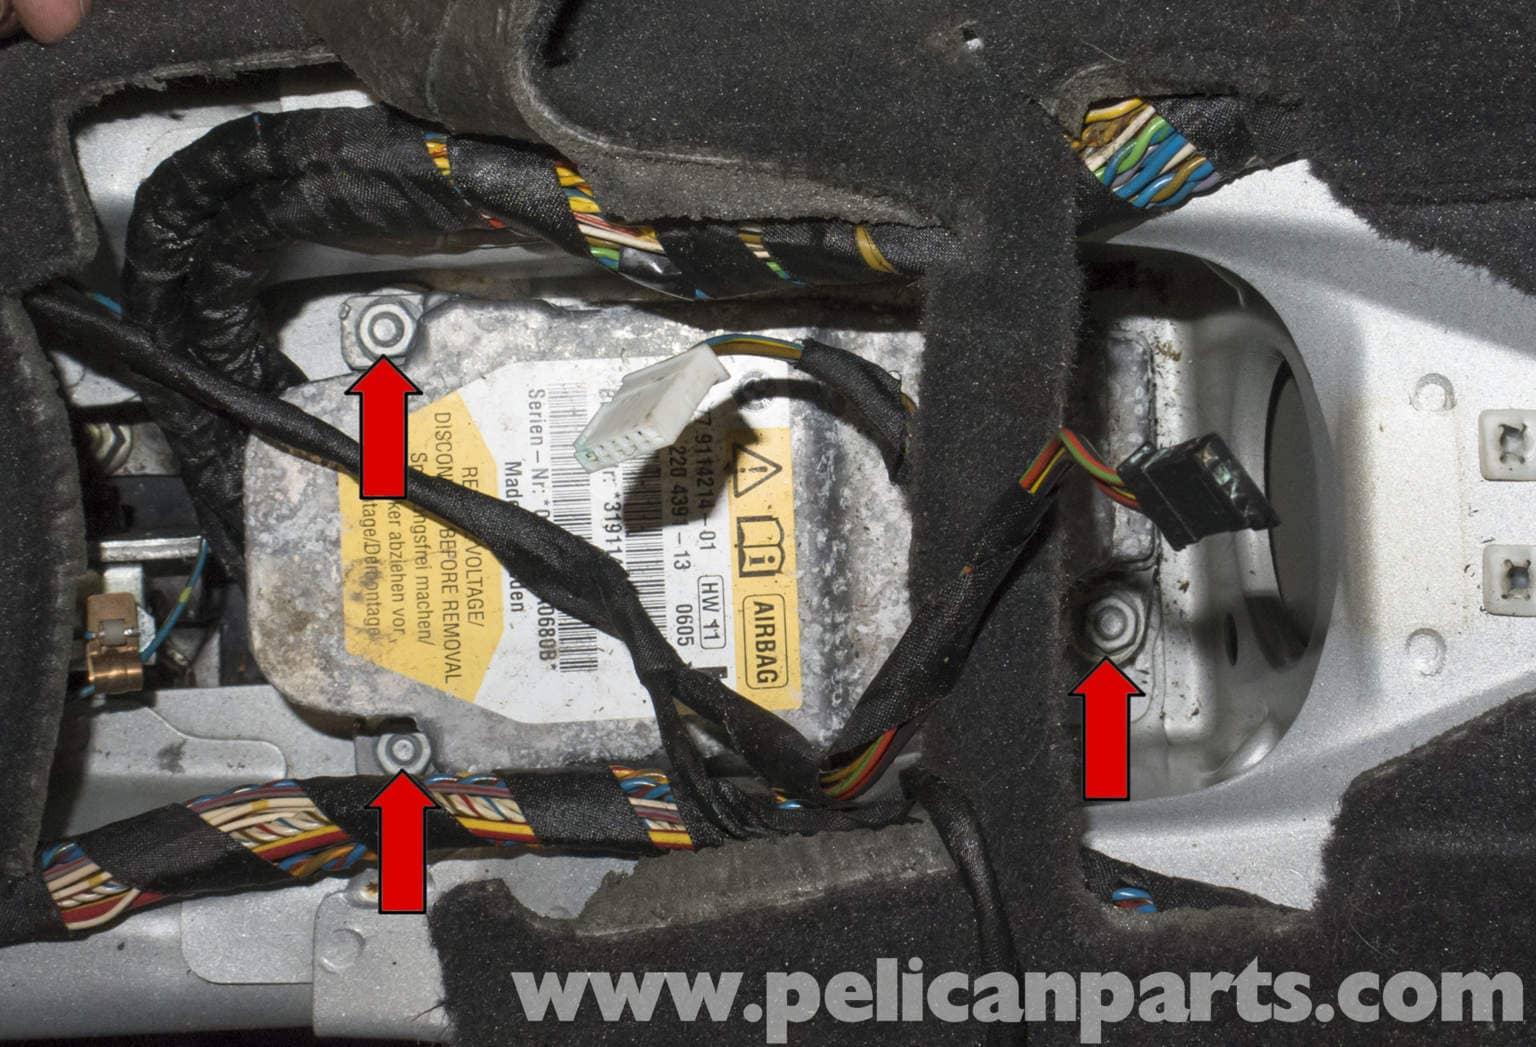 bmw z4m airbag module replacement e85 2003 2008 pelican parts rh pelicanparts com 2012 BMW Z4 Wiring-Diagram BMW Wiring Harness Diagram